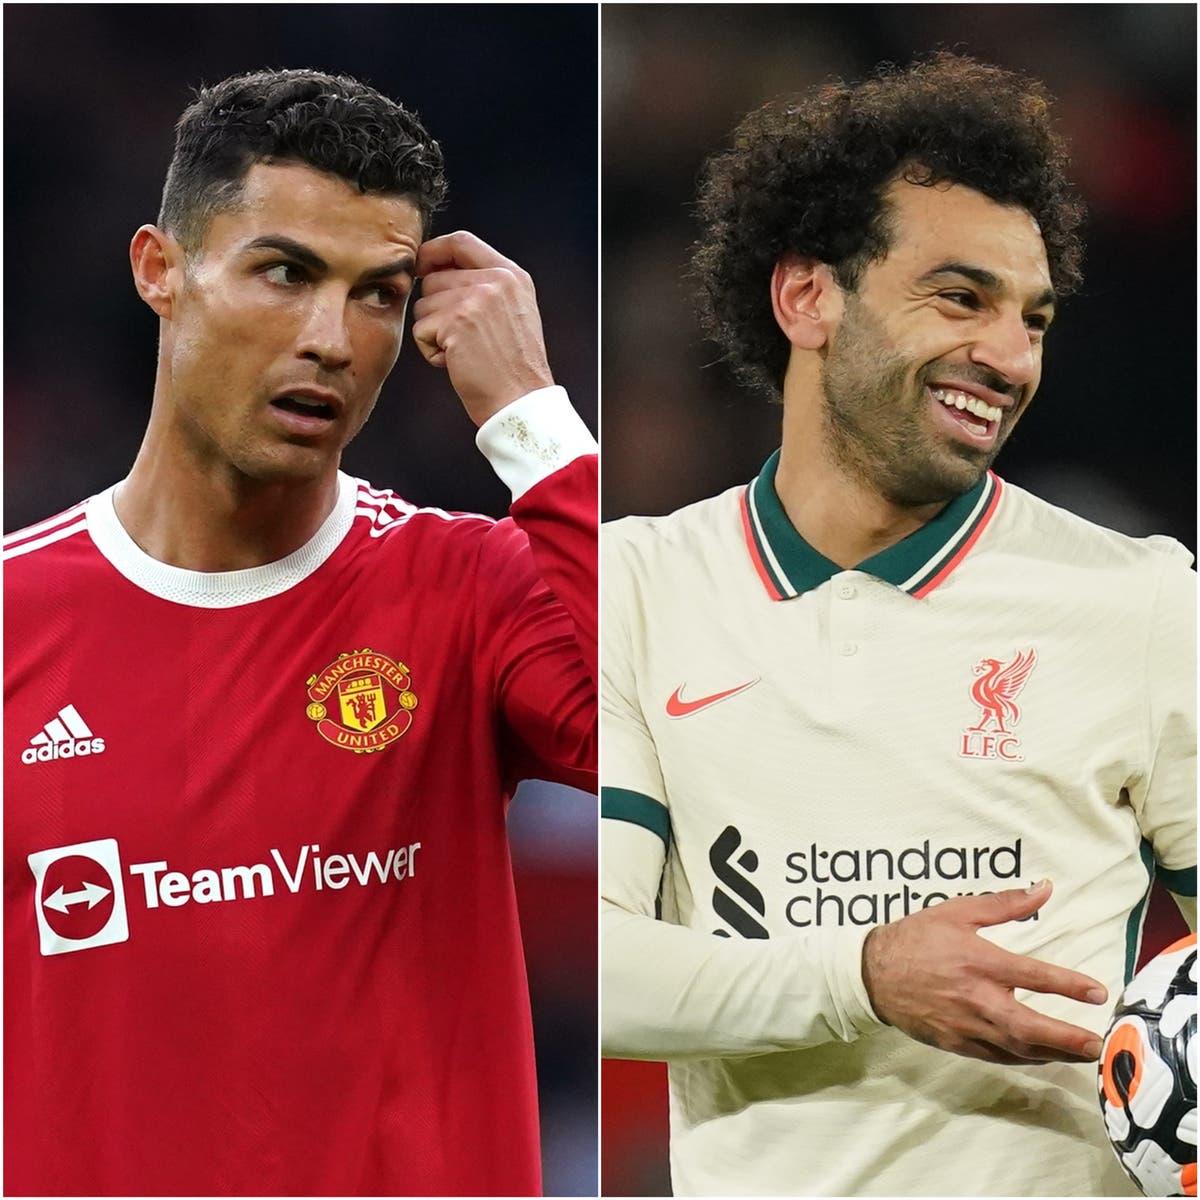 Mohamed Salah shines as Cristiano Ronaldo fumes in Old Trafford thrashing